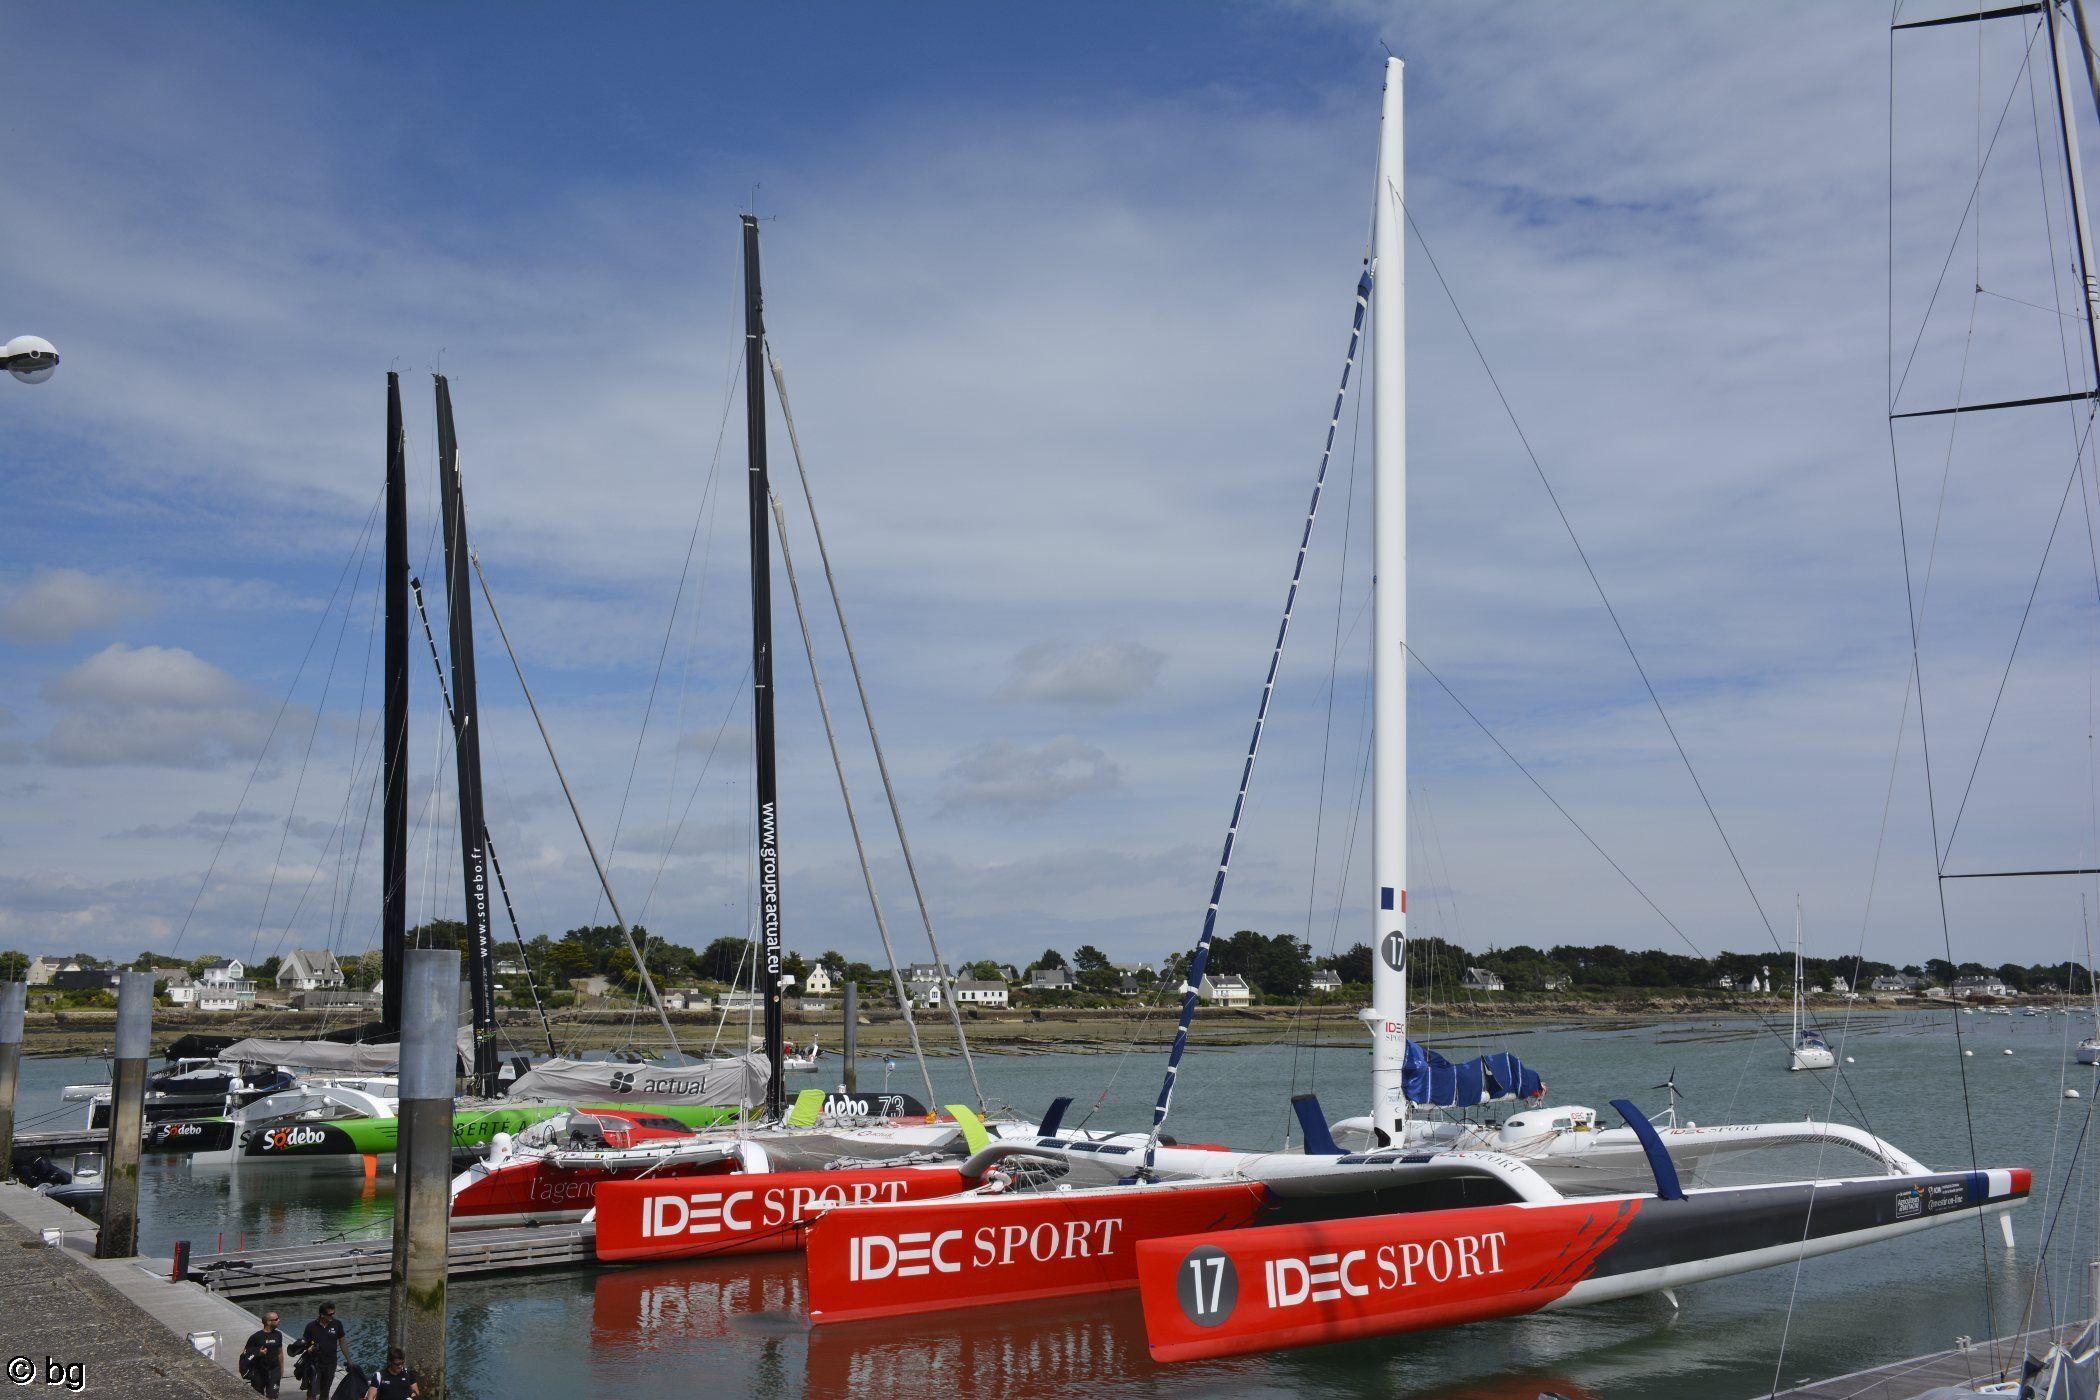 la-trinite-sur-mer-le-port_2